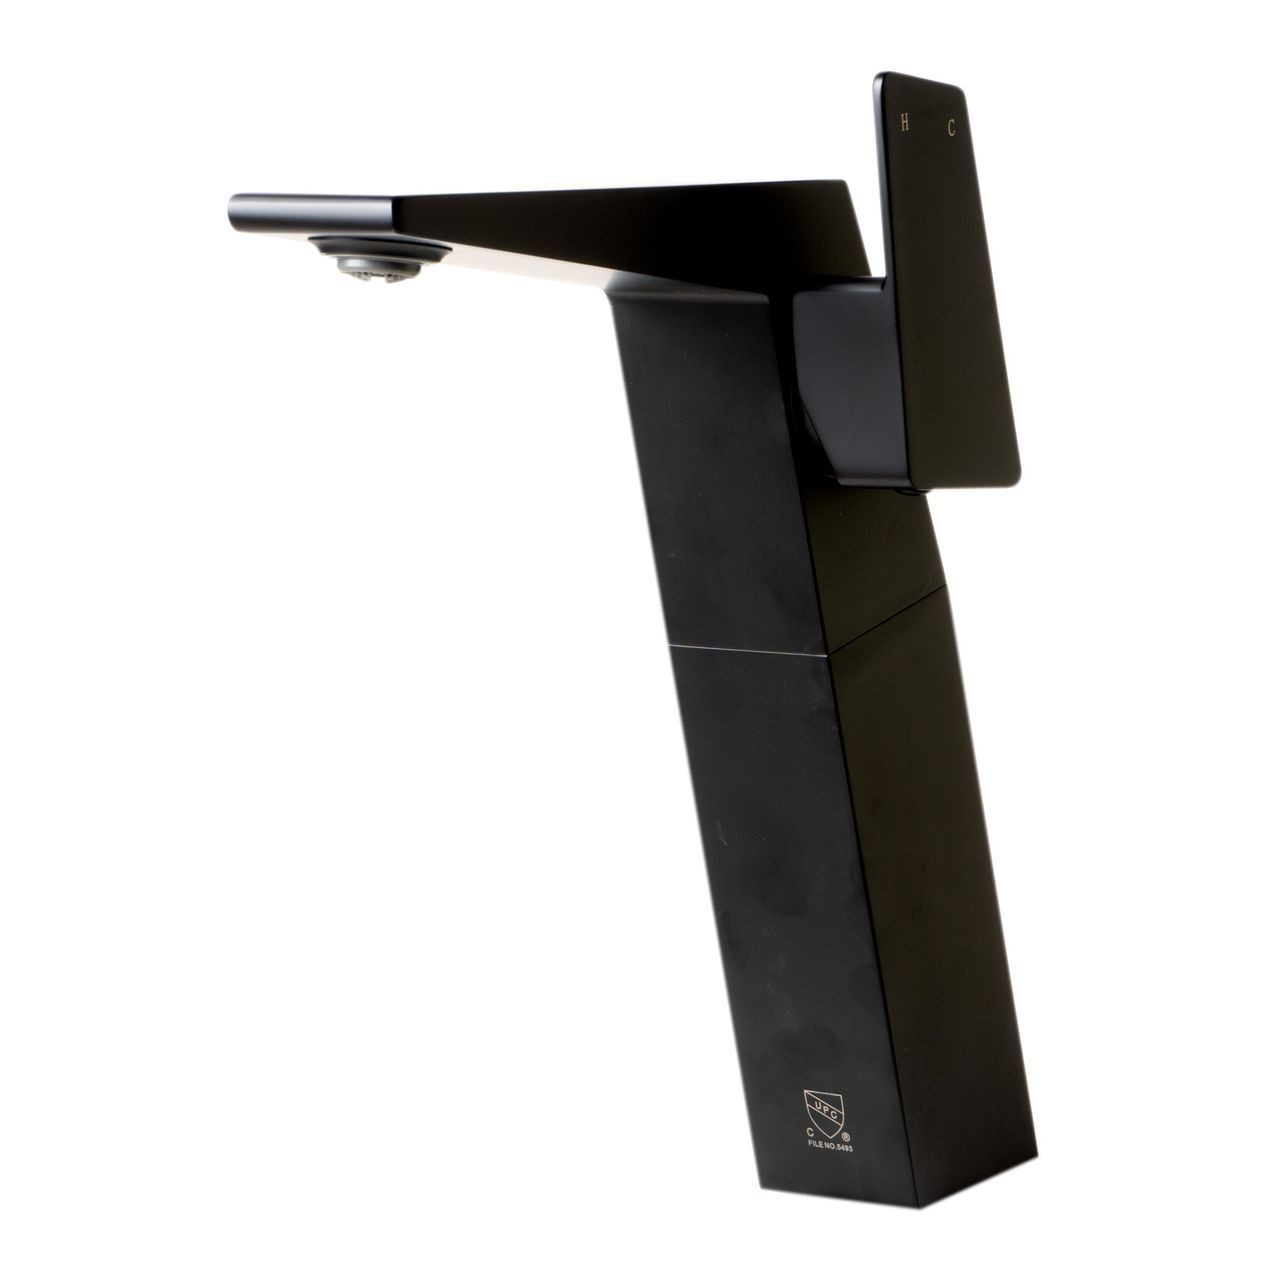 ALFI Black Matte Single Hole Tall Bathroom Faucet